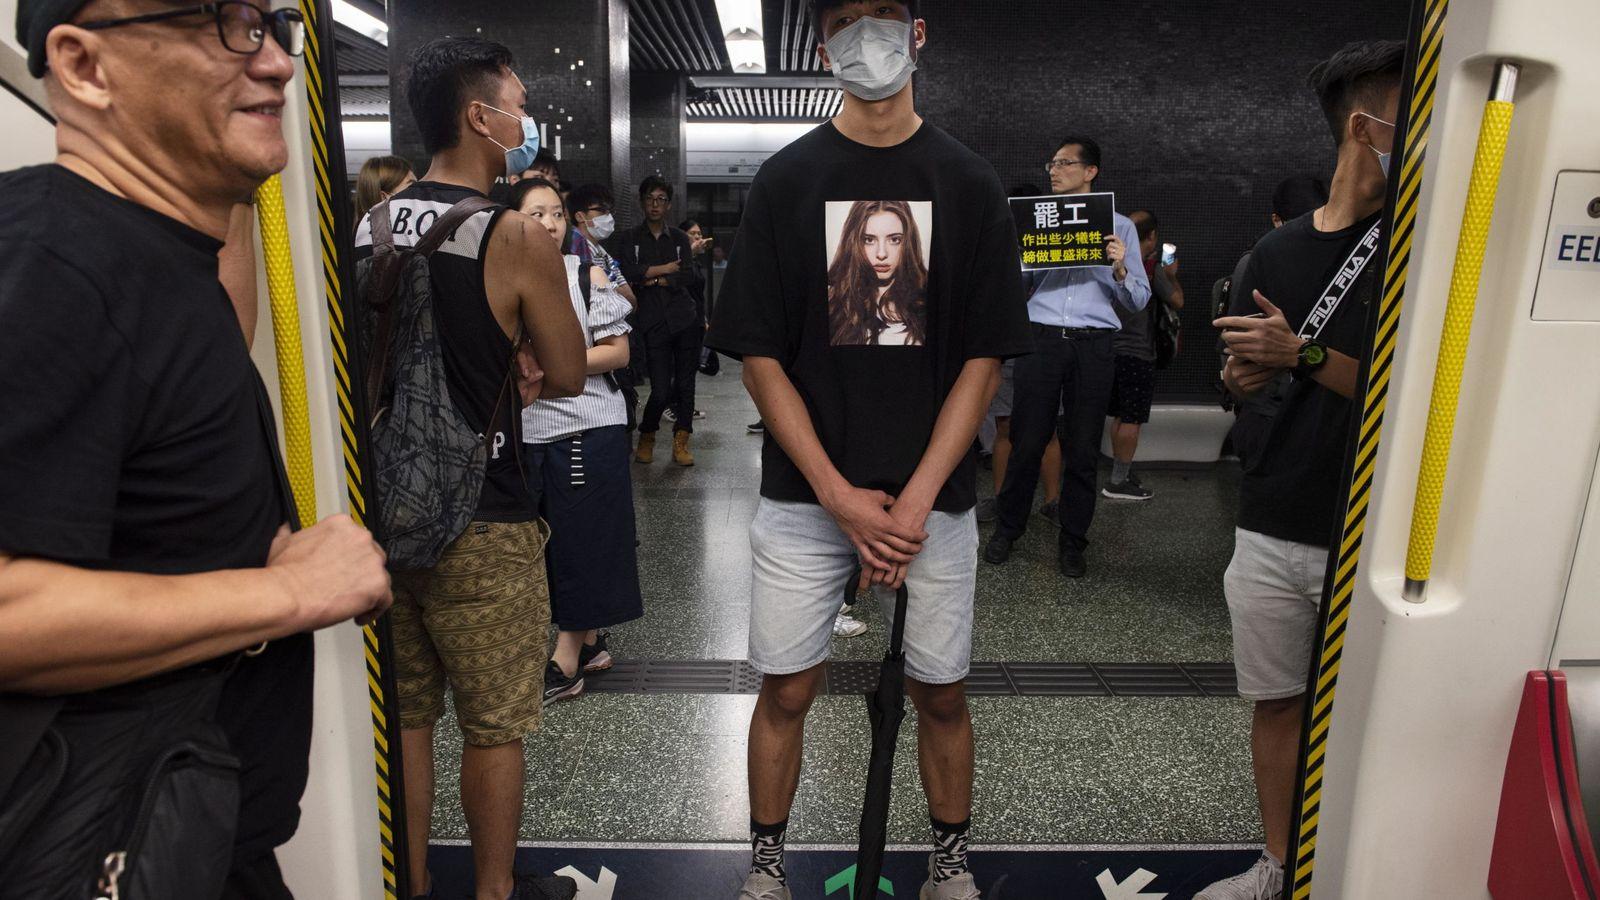 Foto: Manifestantes bloquean las puertas de un vagón del metro en Hong Kong (Reuters)